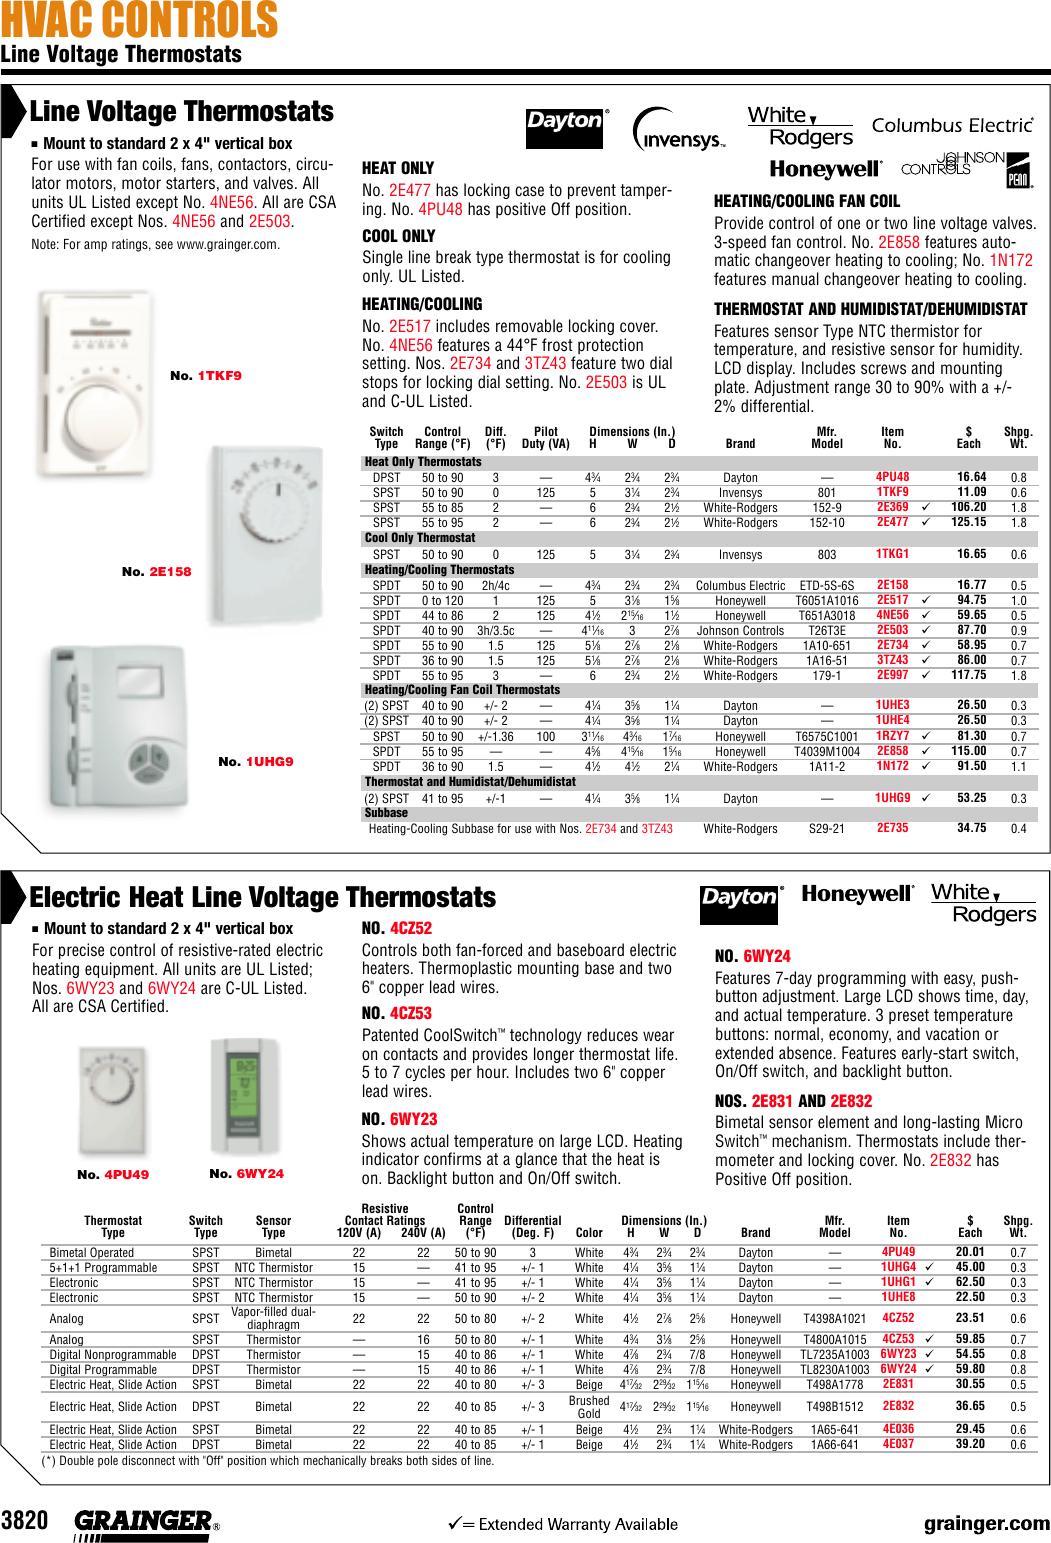 White Rodgers 2 00E158 Users Manual 3820.qxp